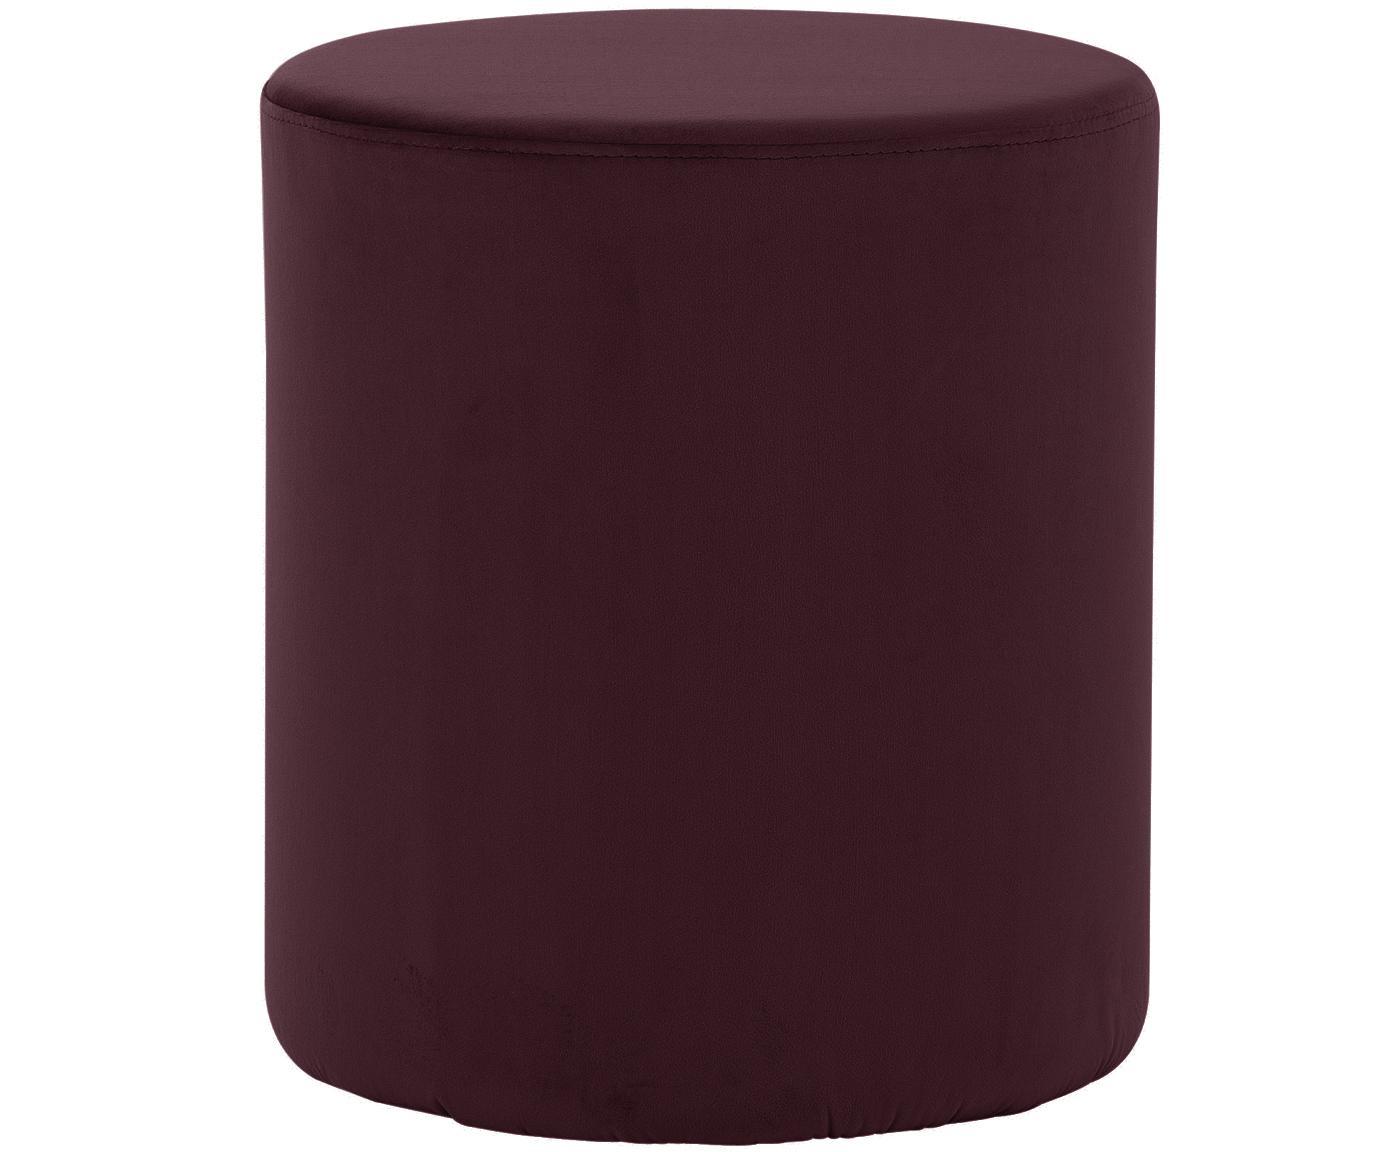 Samt-Hocker Daisy, Bezug: Samt (Polyester) 15.000 S, Rahmen: Mitteldichte Holzfaserpla, Dunkelrot, Ø 38 x H 46 cm